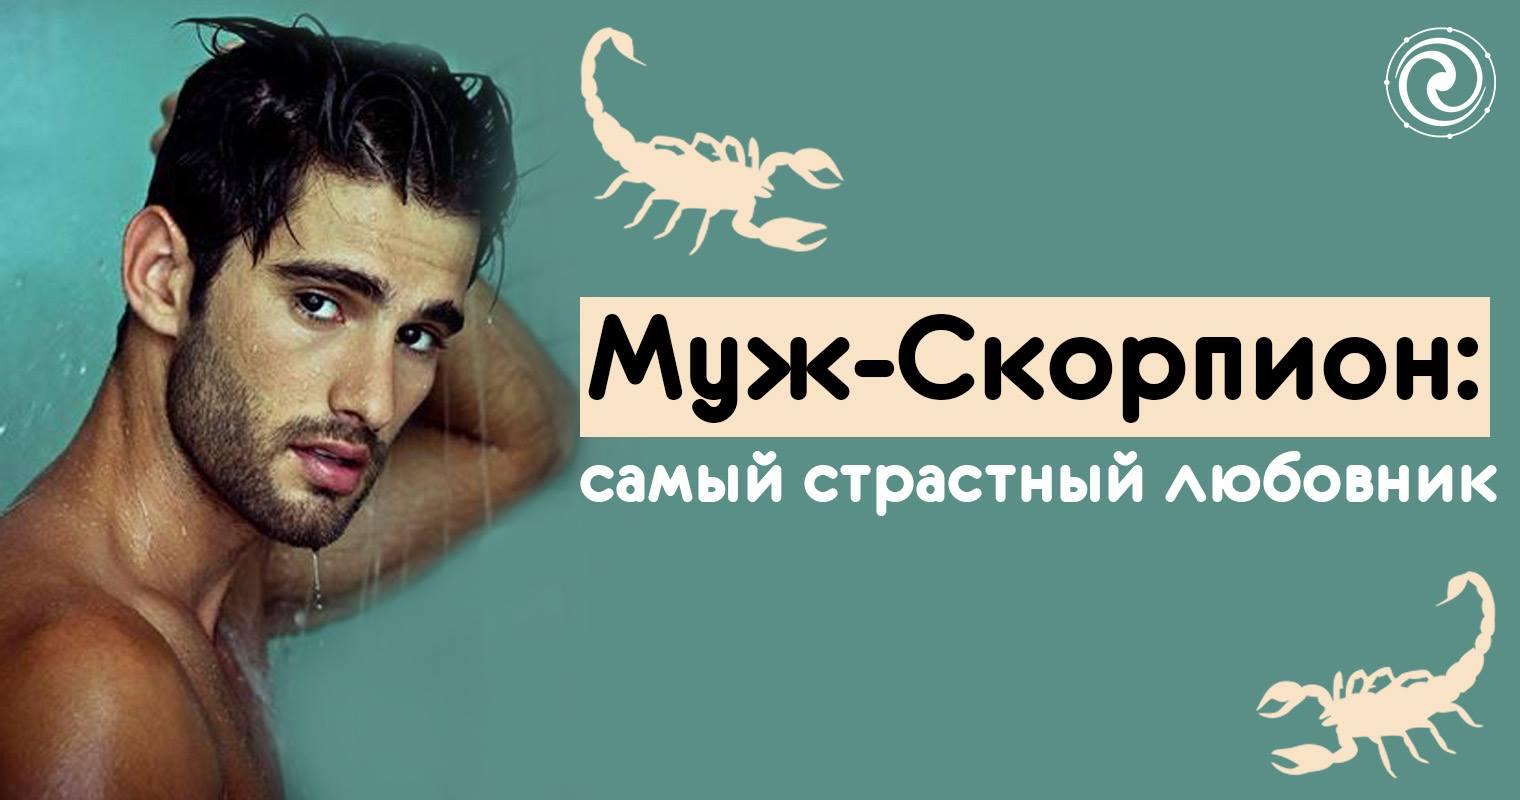 Скорпион секс на первом свидании